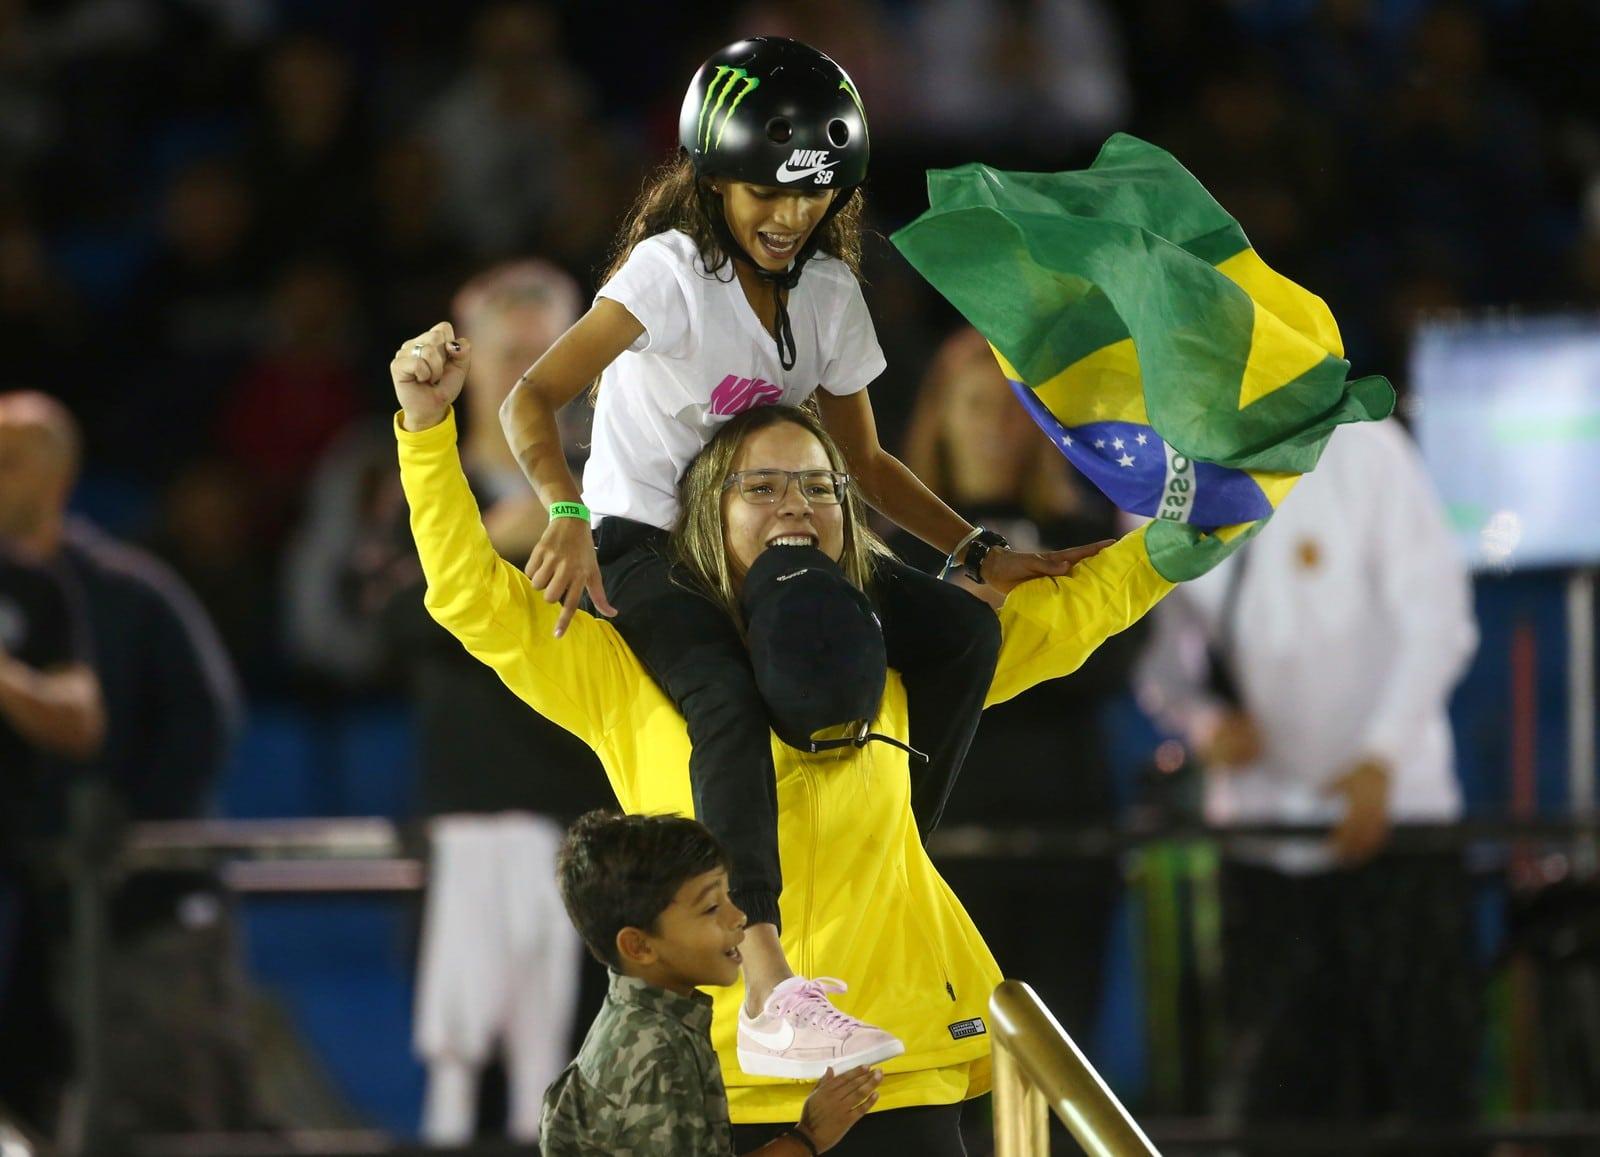 Pamela Rosa campeã mundial e Rayssa Leal vice mundial de skate street